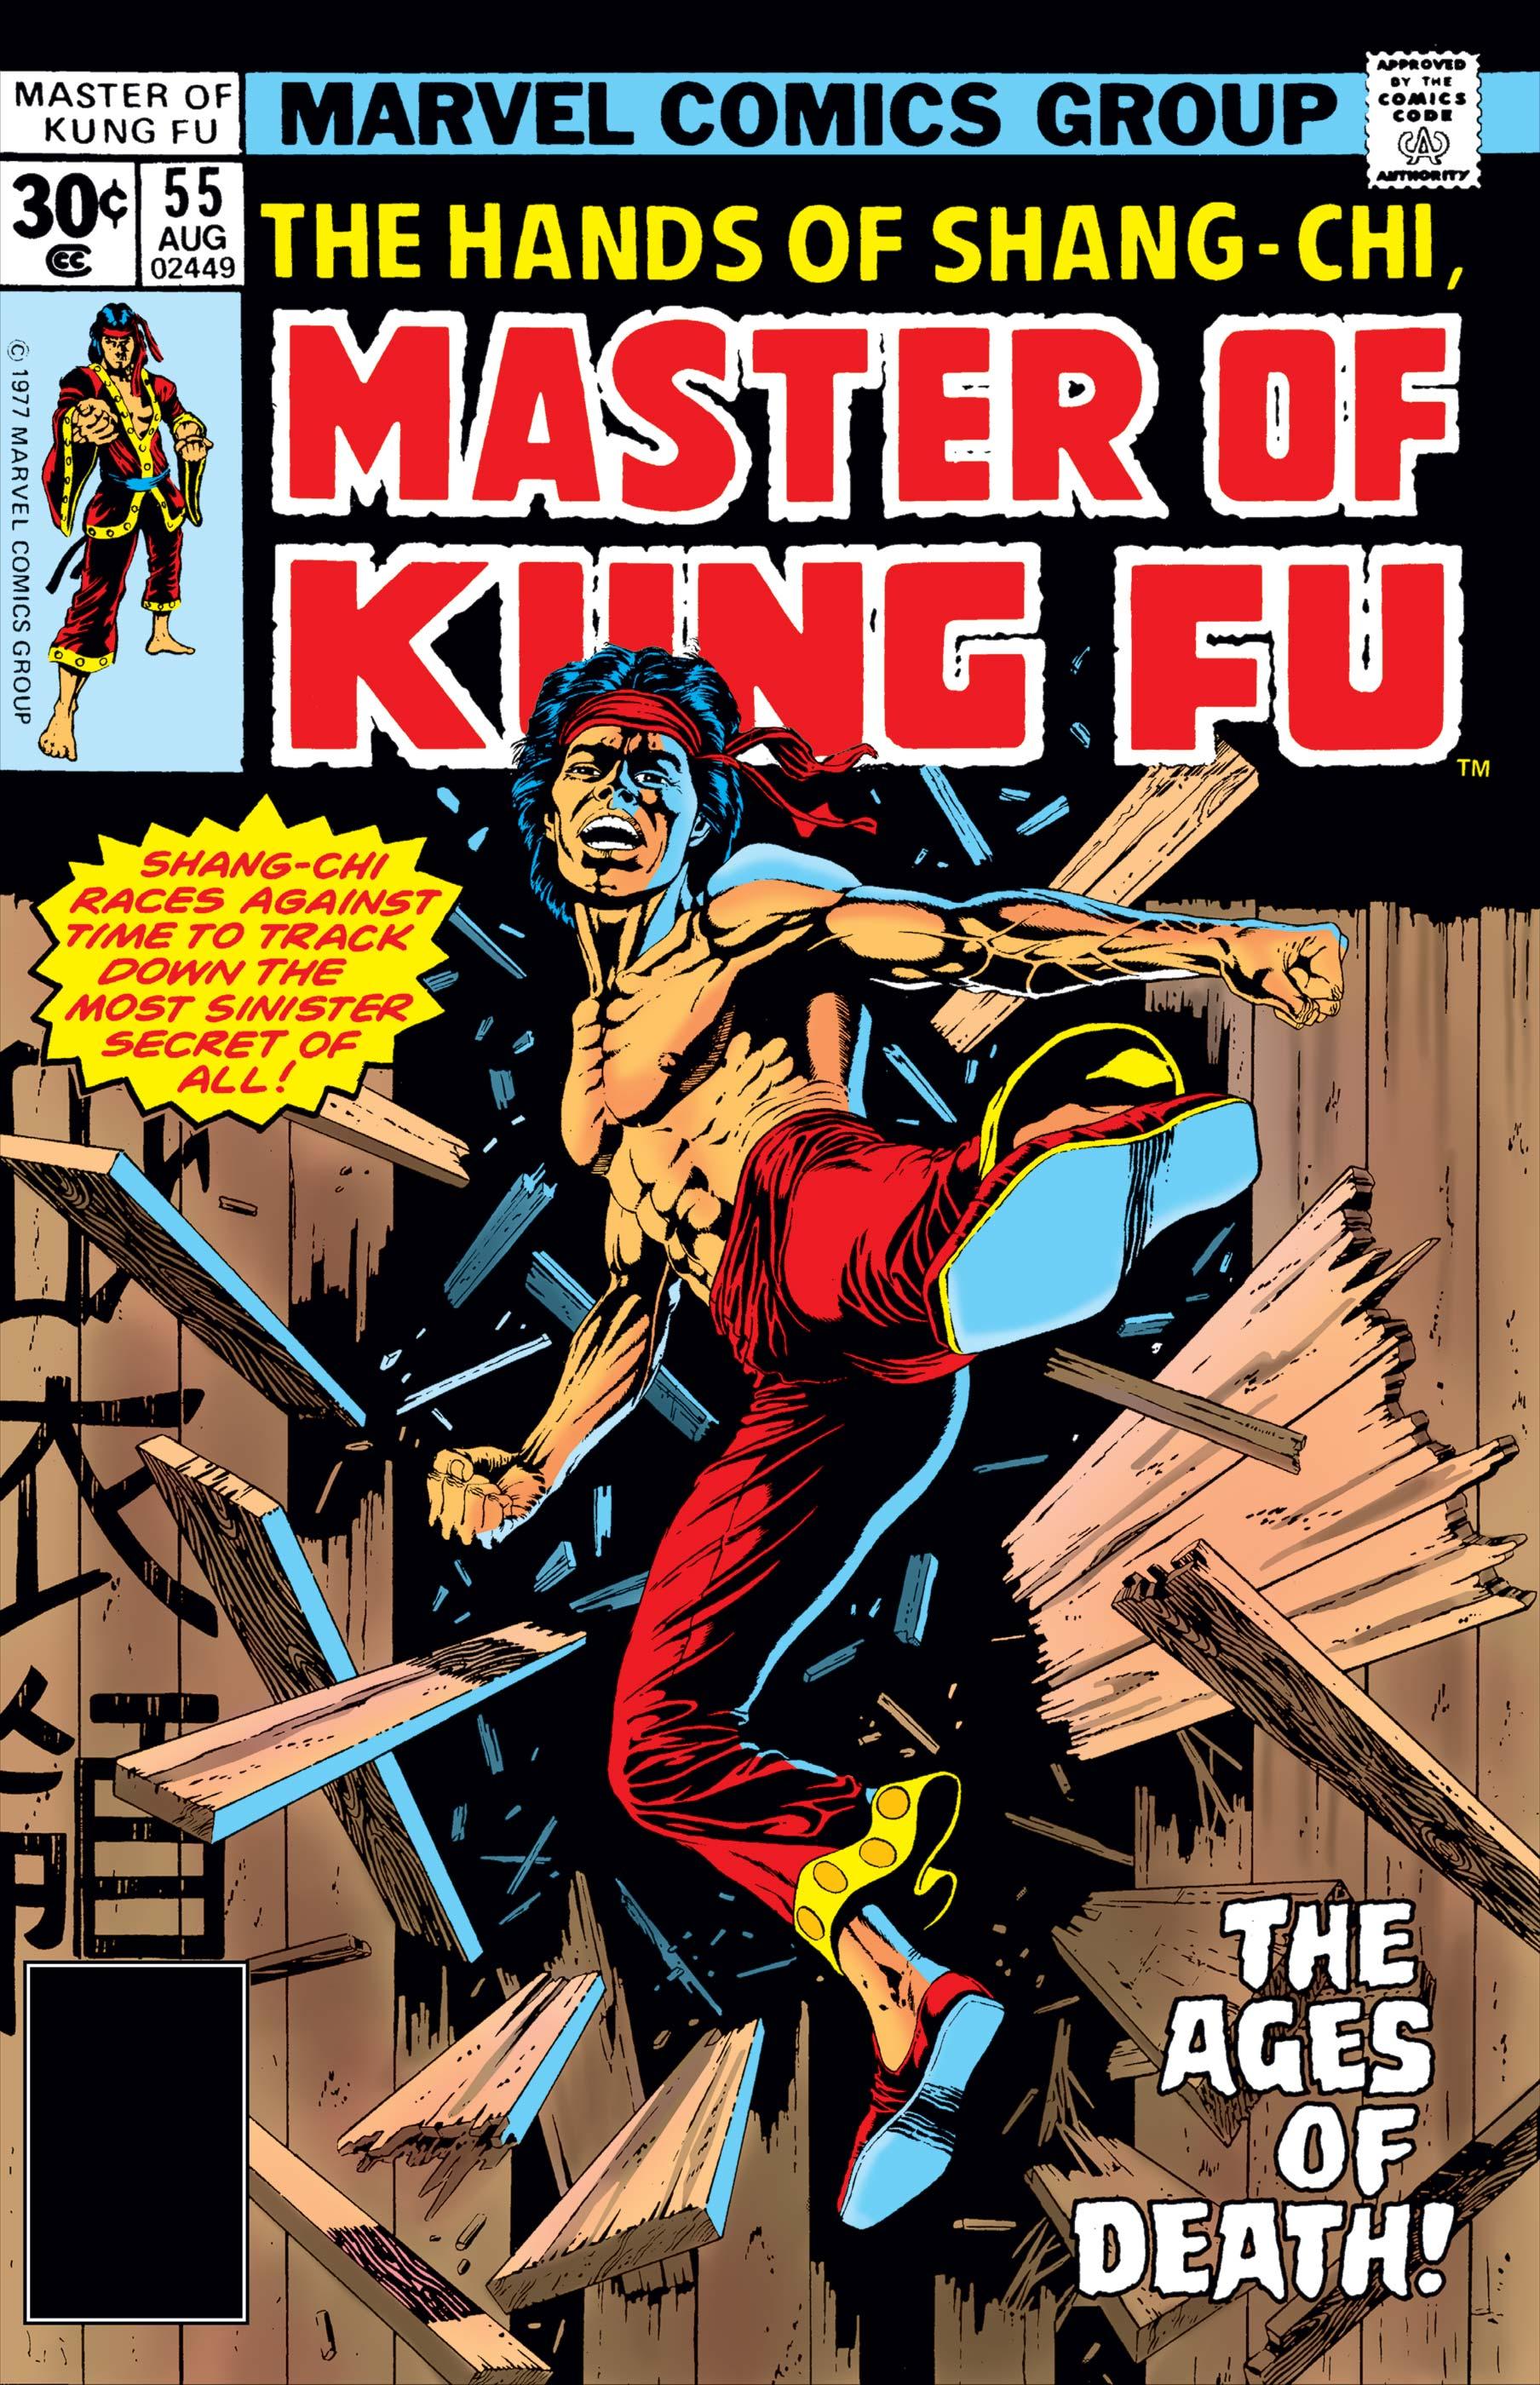 Master of Kung Fu (1974) #55